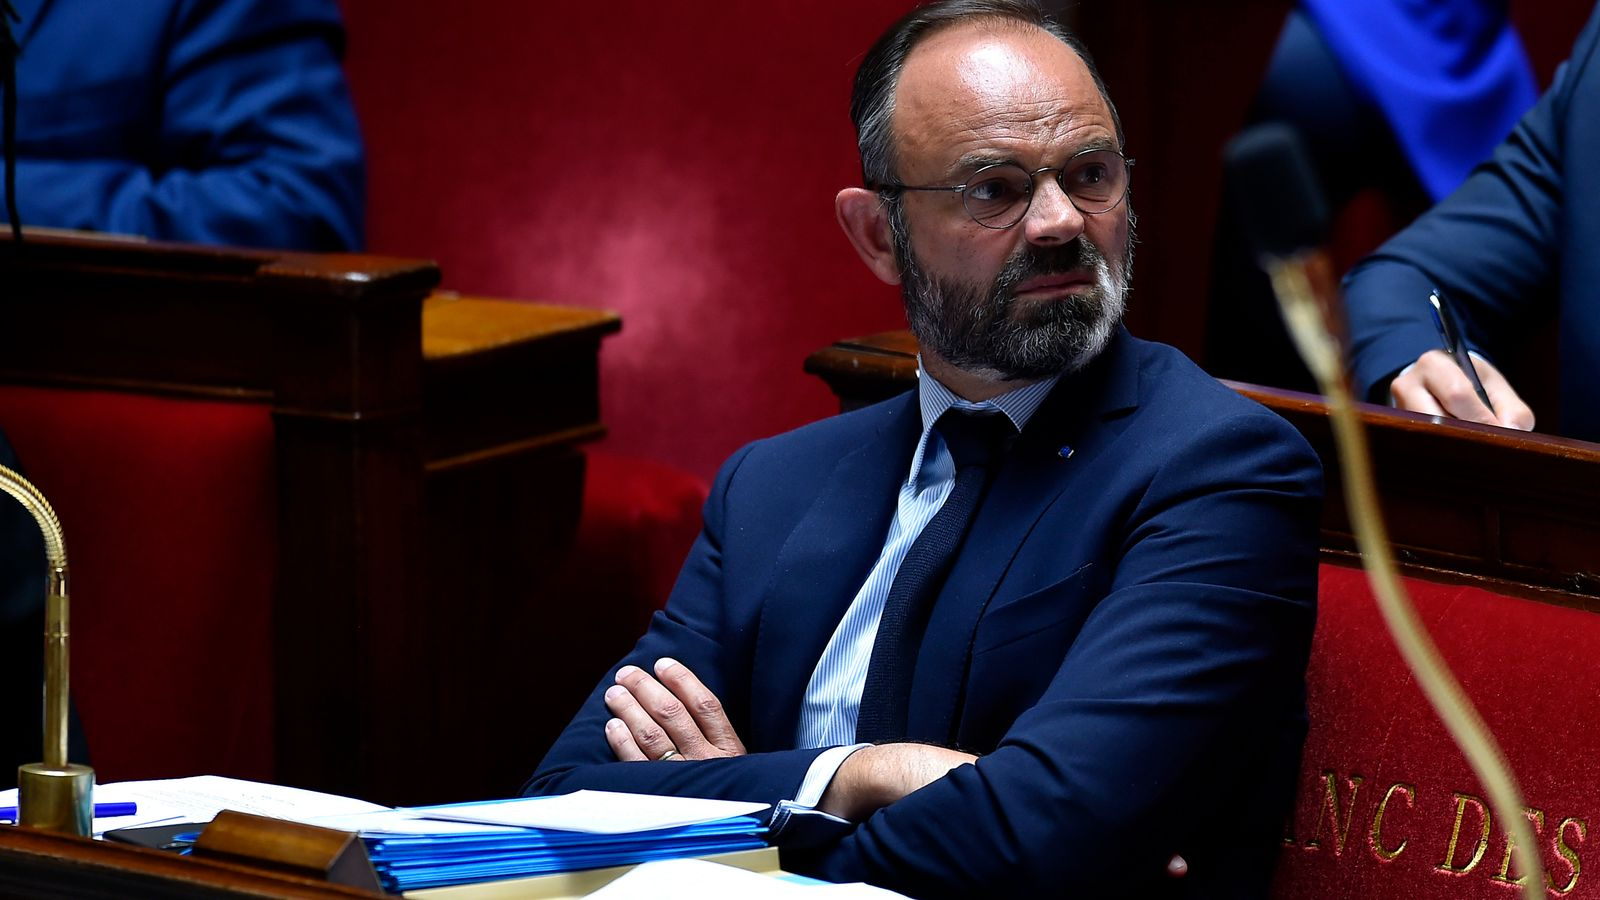 Kryeministri i Francës jep dorëheqjen